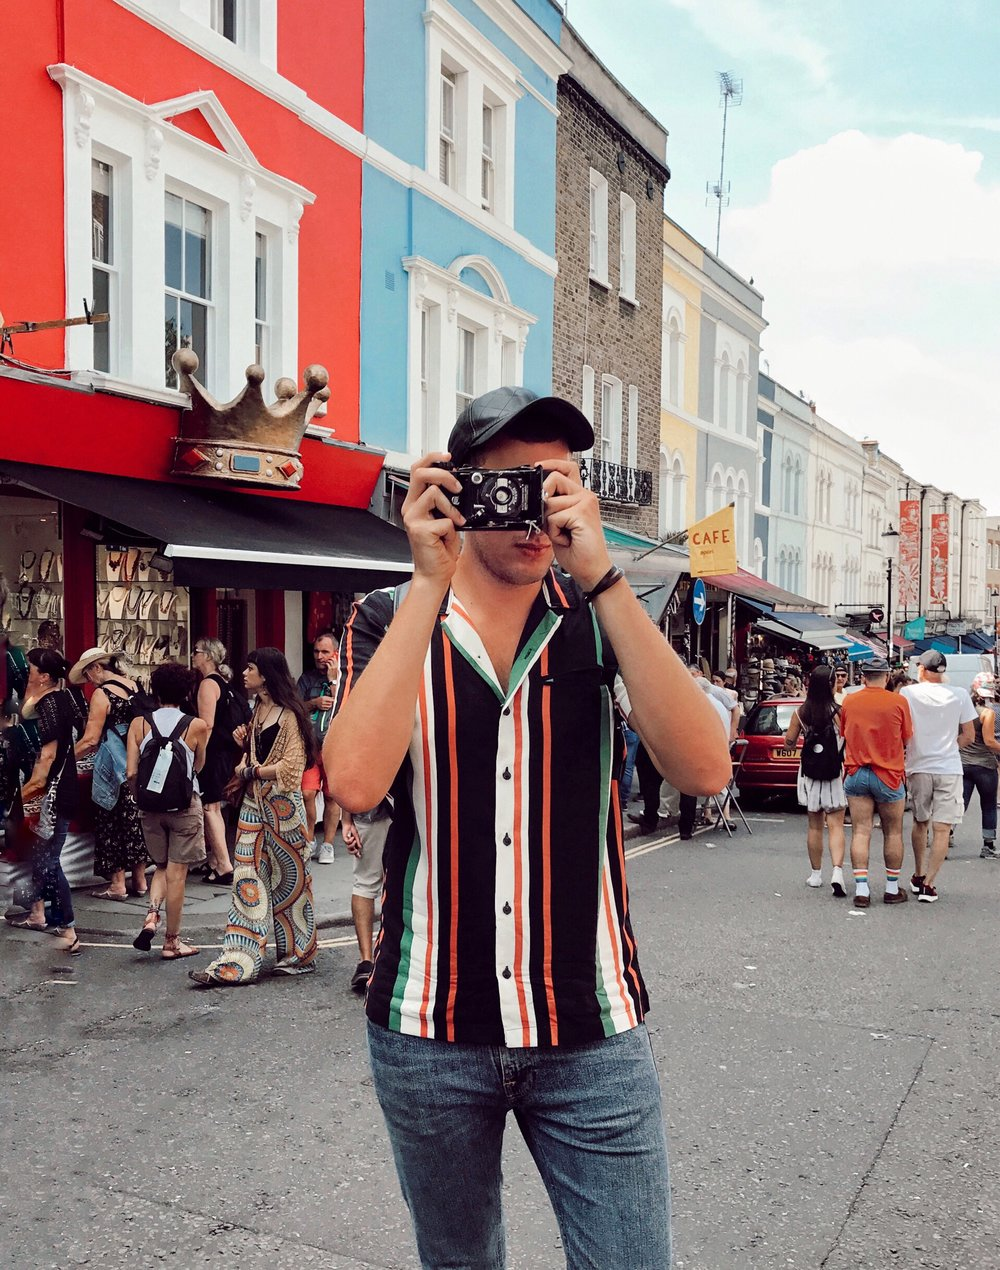 Exploring through Notting Hill